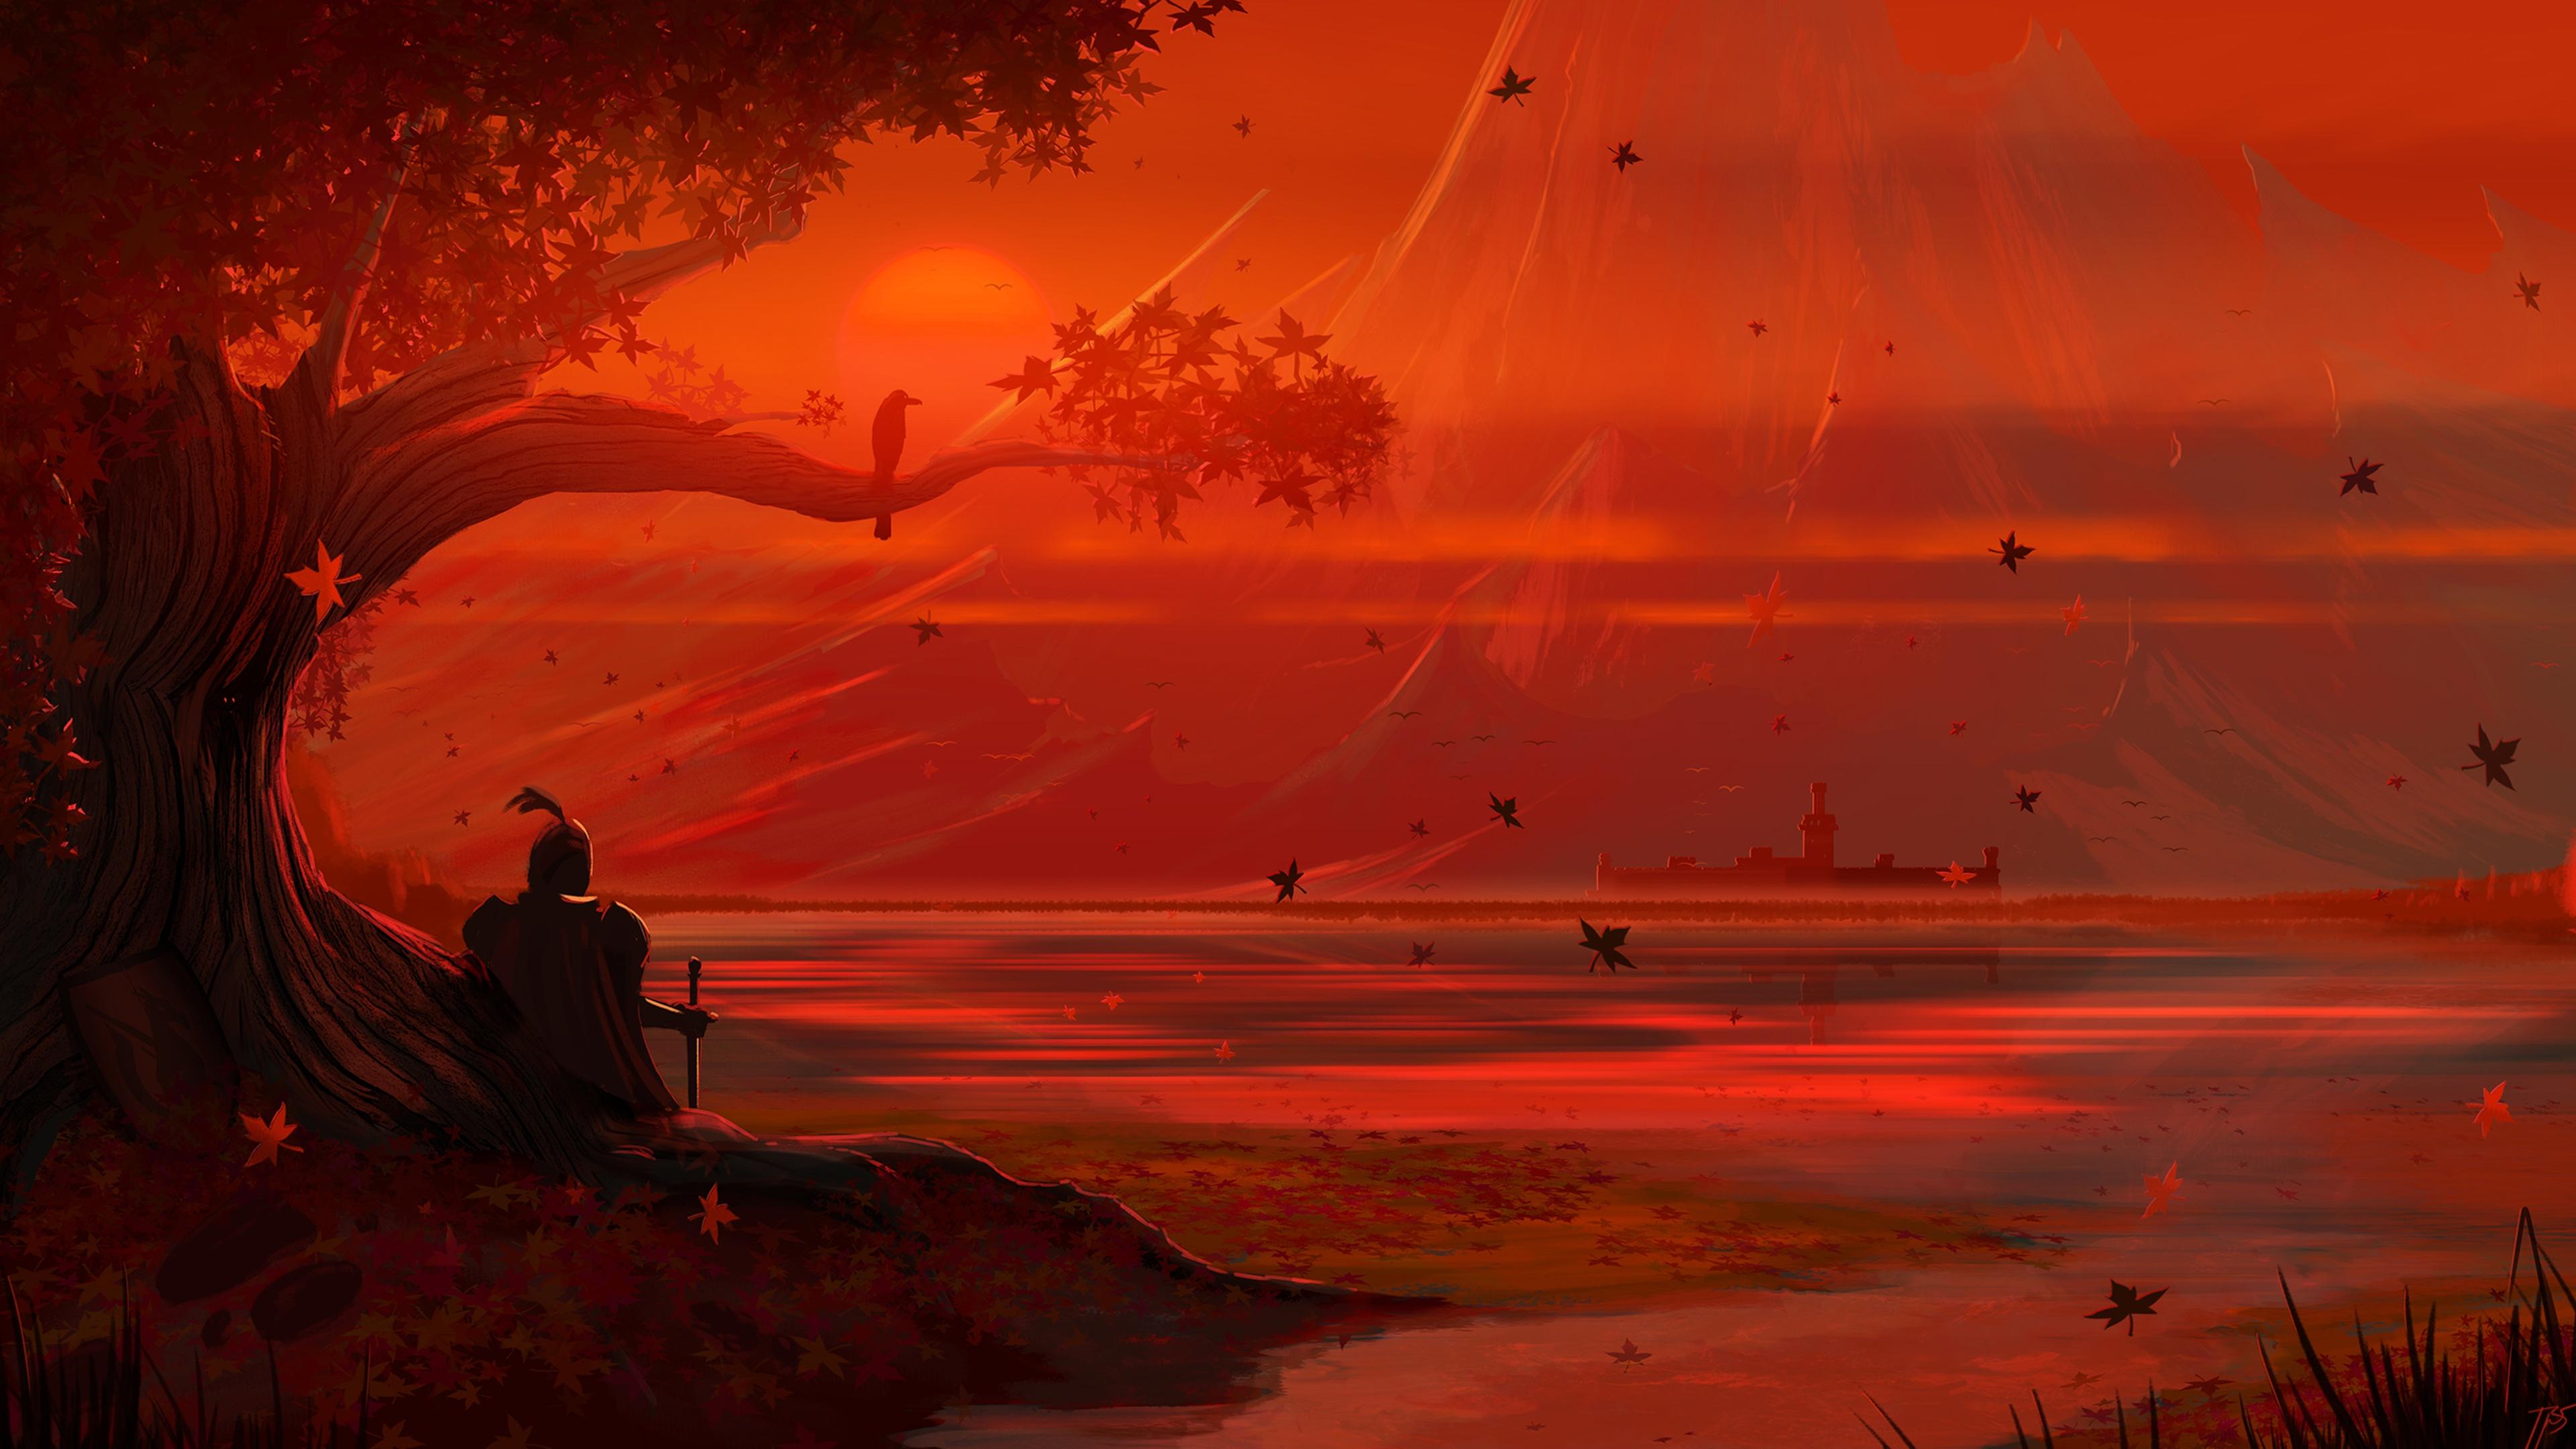 Fall Art 1080p wallpaper